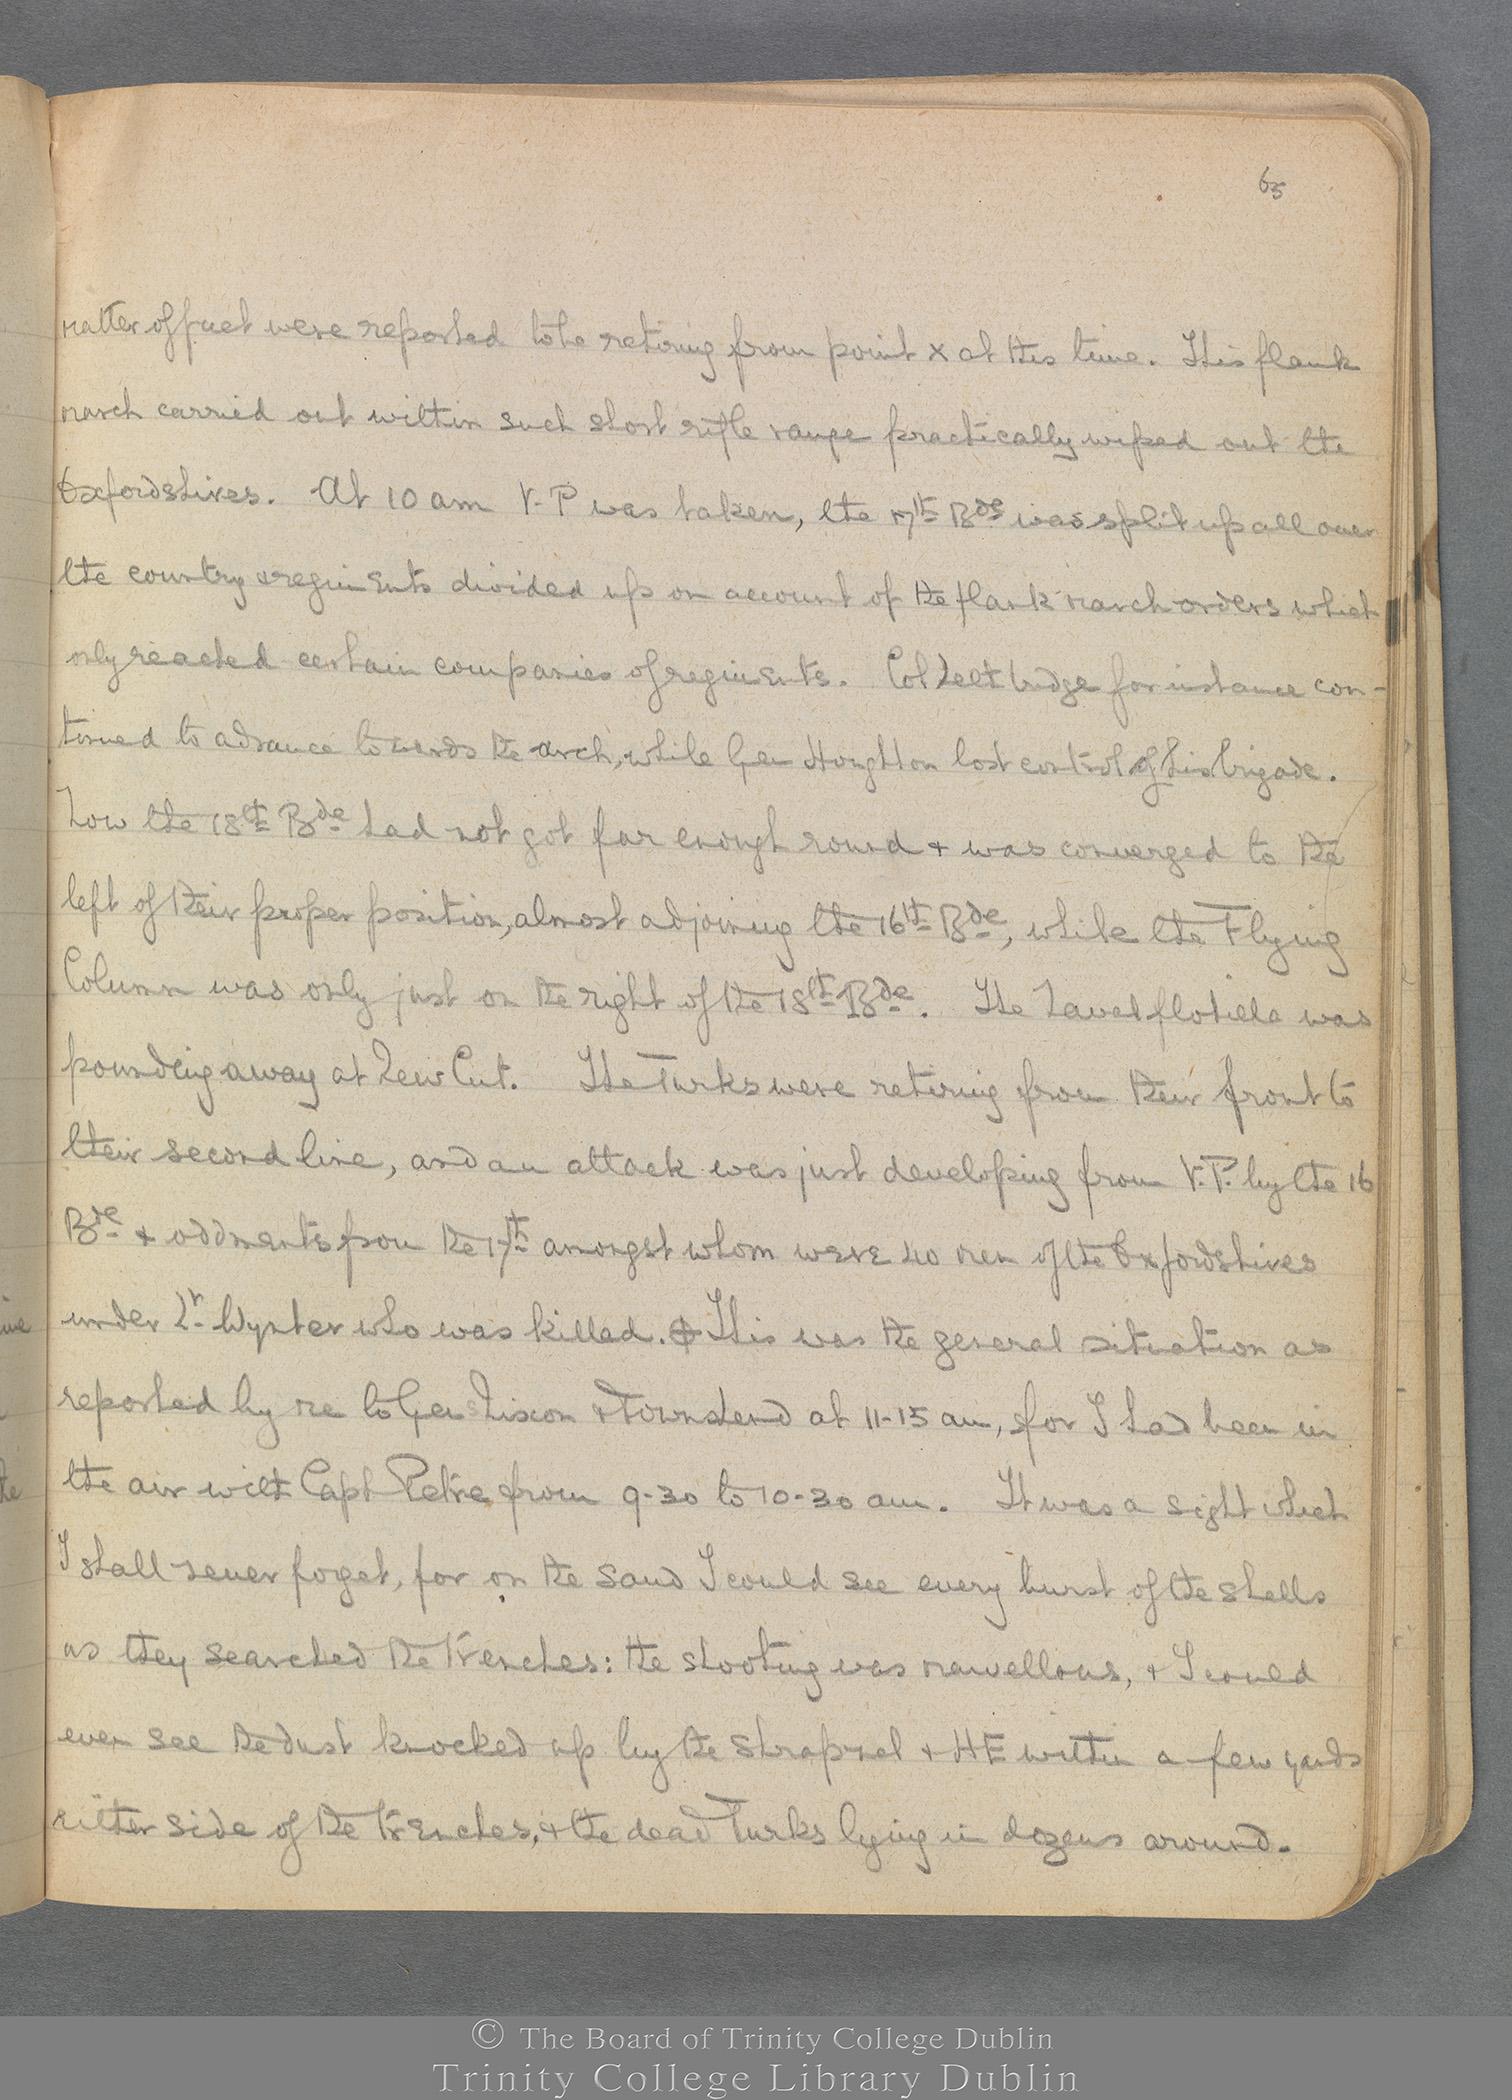 TCD MS 3414 folio 65 recto